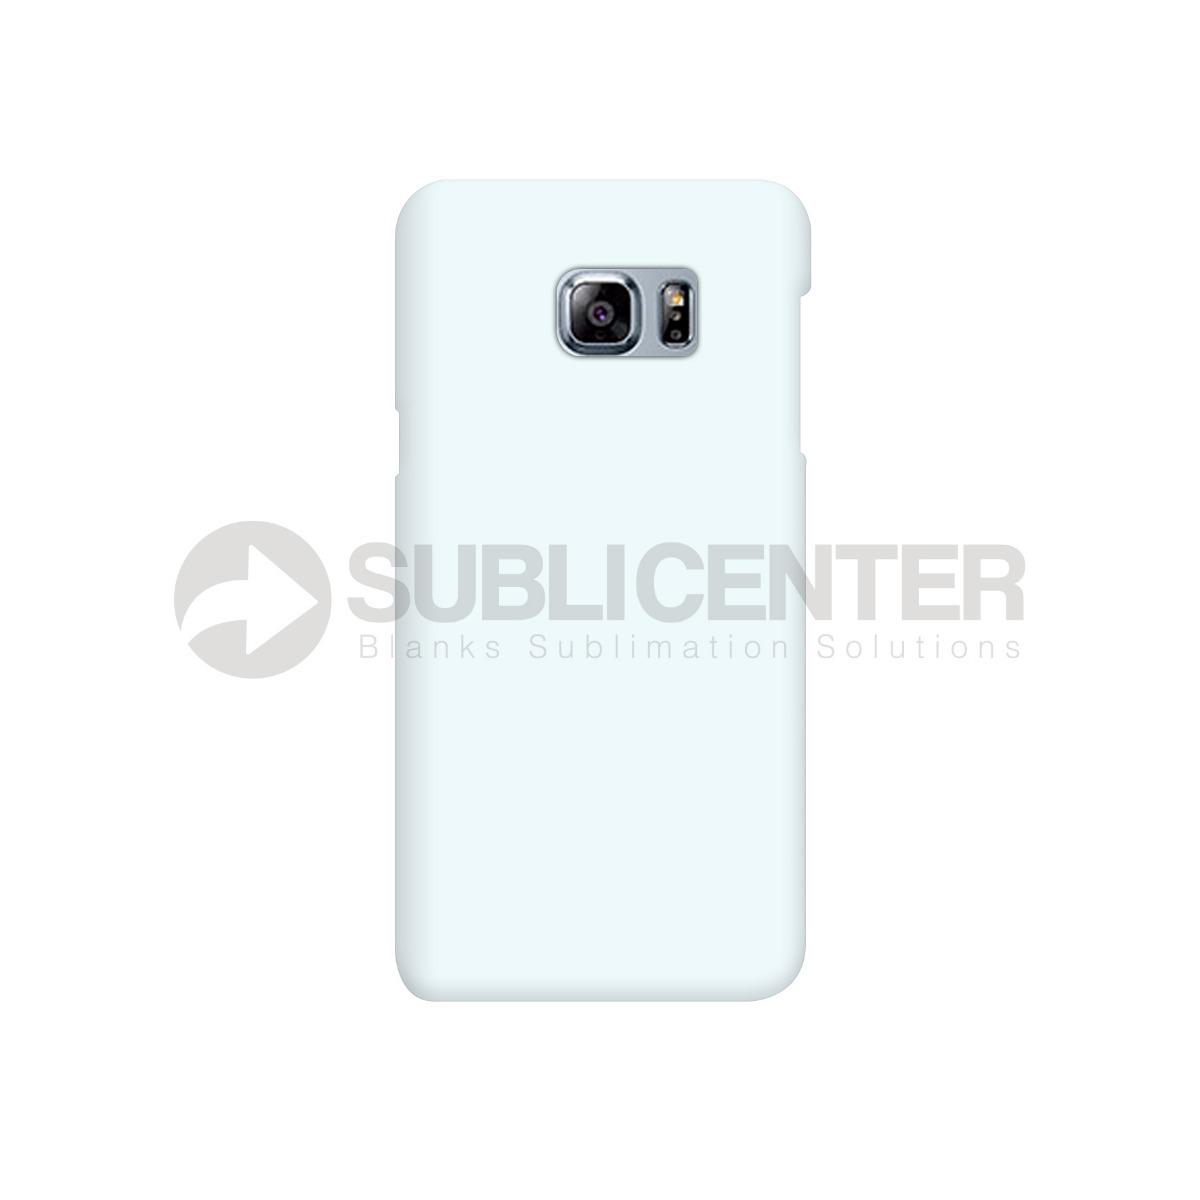 2027fcf57b7 Fundas Para Celular 3d Sublimable Samsung Note 5 - $ 55.00 en ...